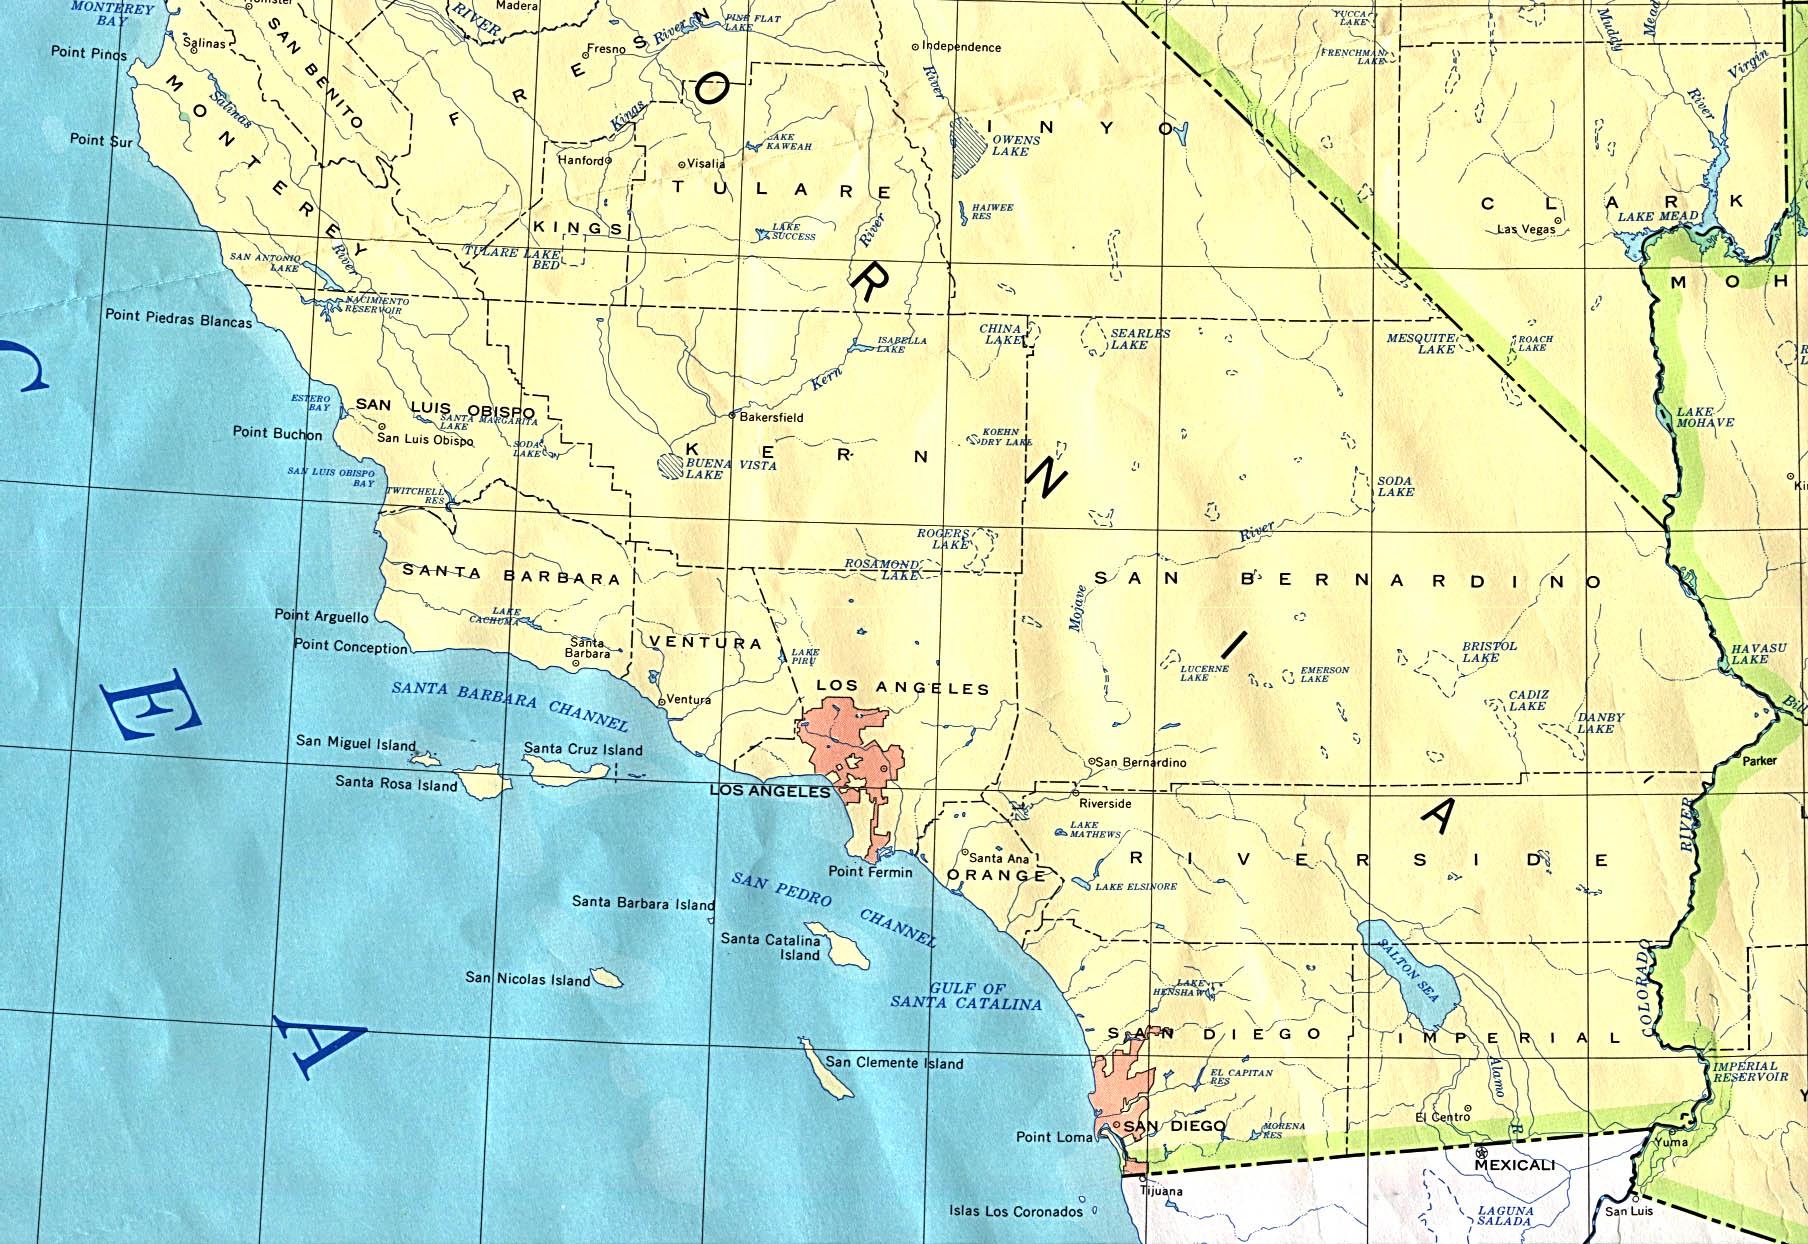 Southern California Map Map Of California Springs Maps Southern - Map Of Southeastern California